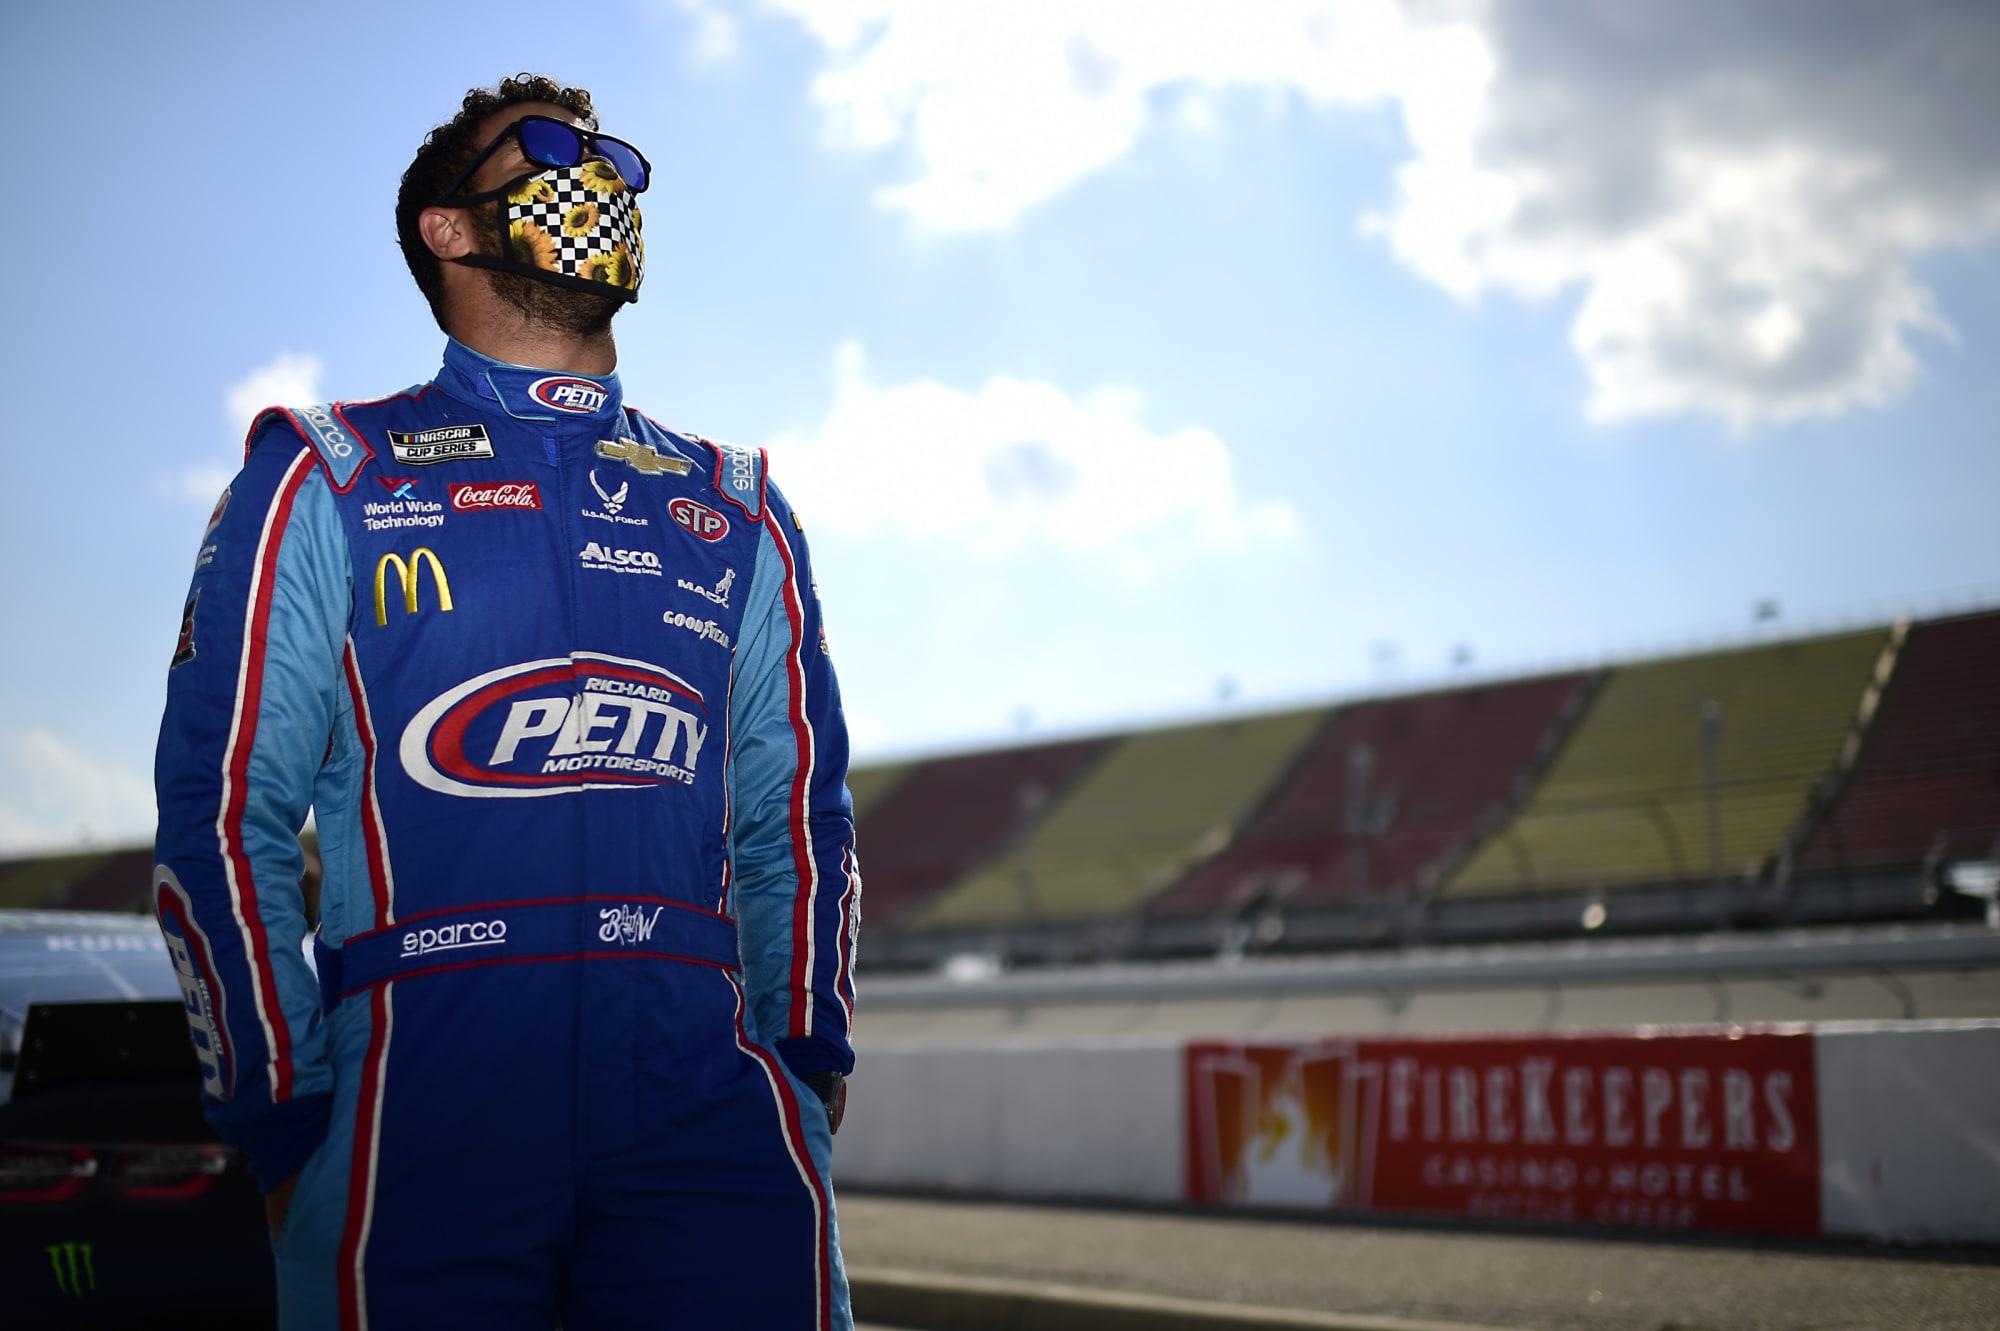 DoorDash jumps into NASCAR, backing Bubba Wallace in multiyear deal